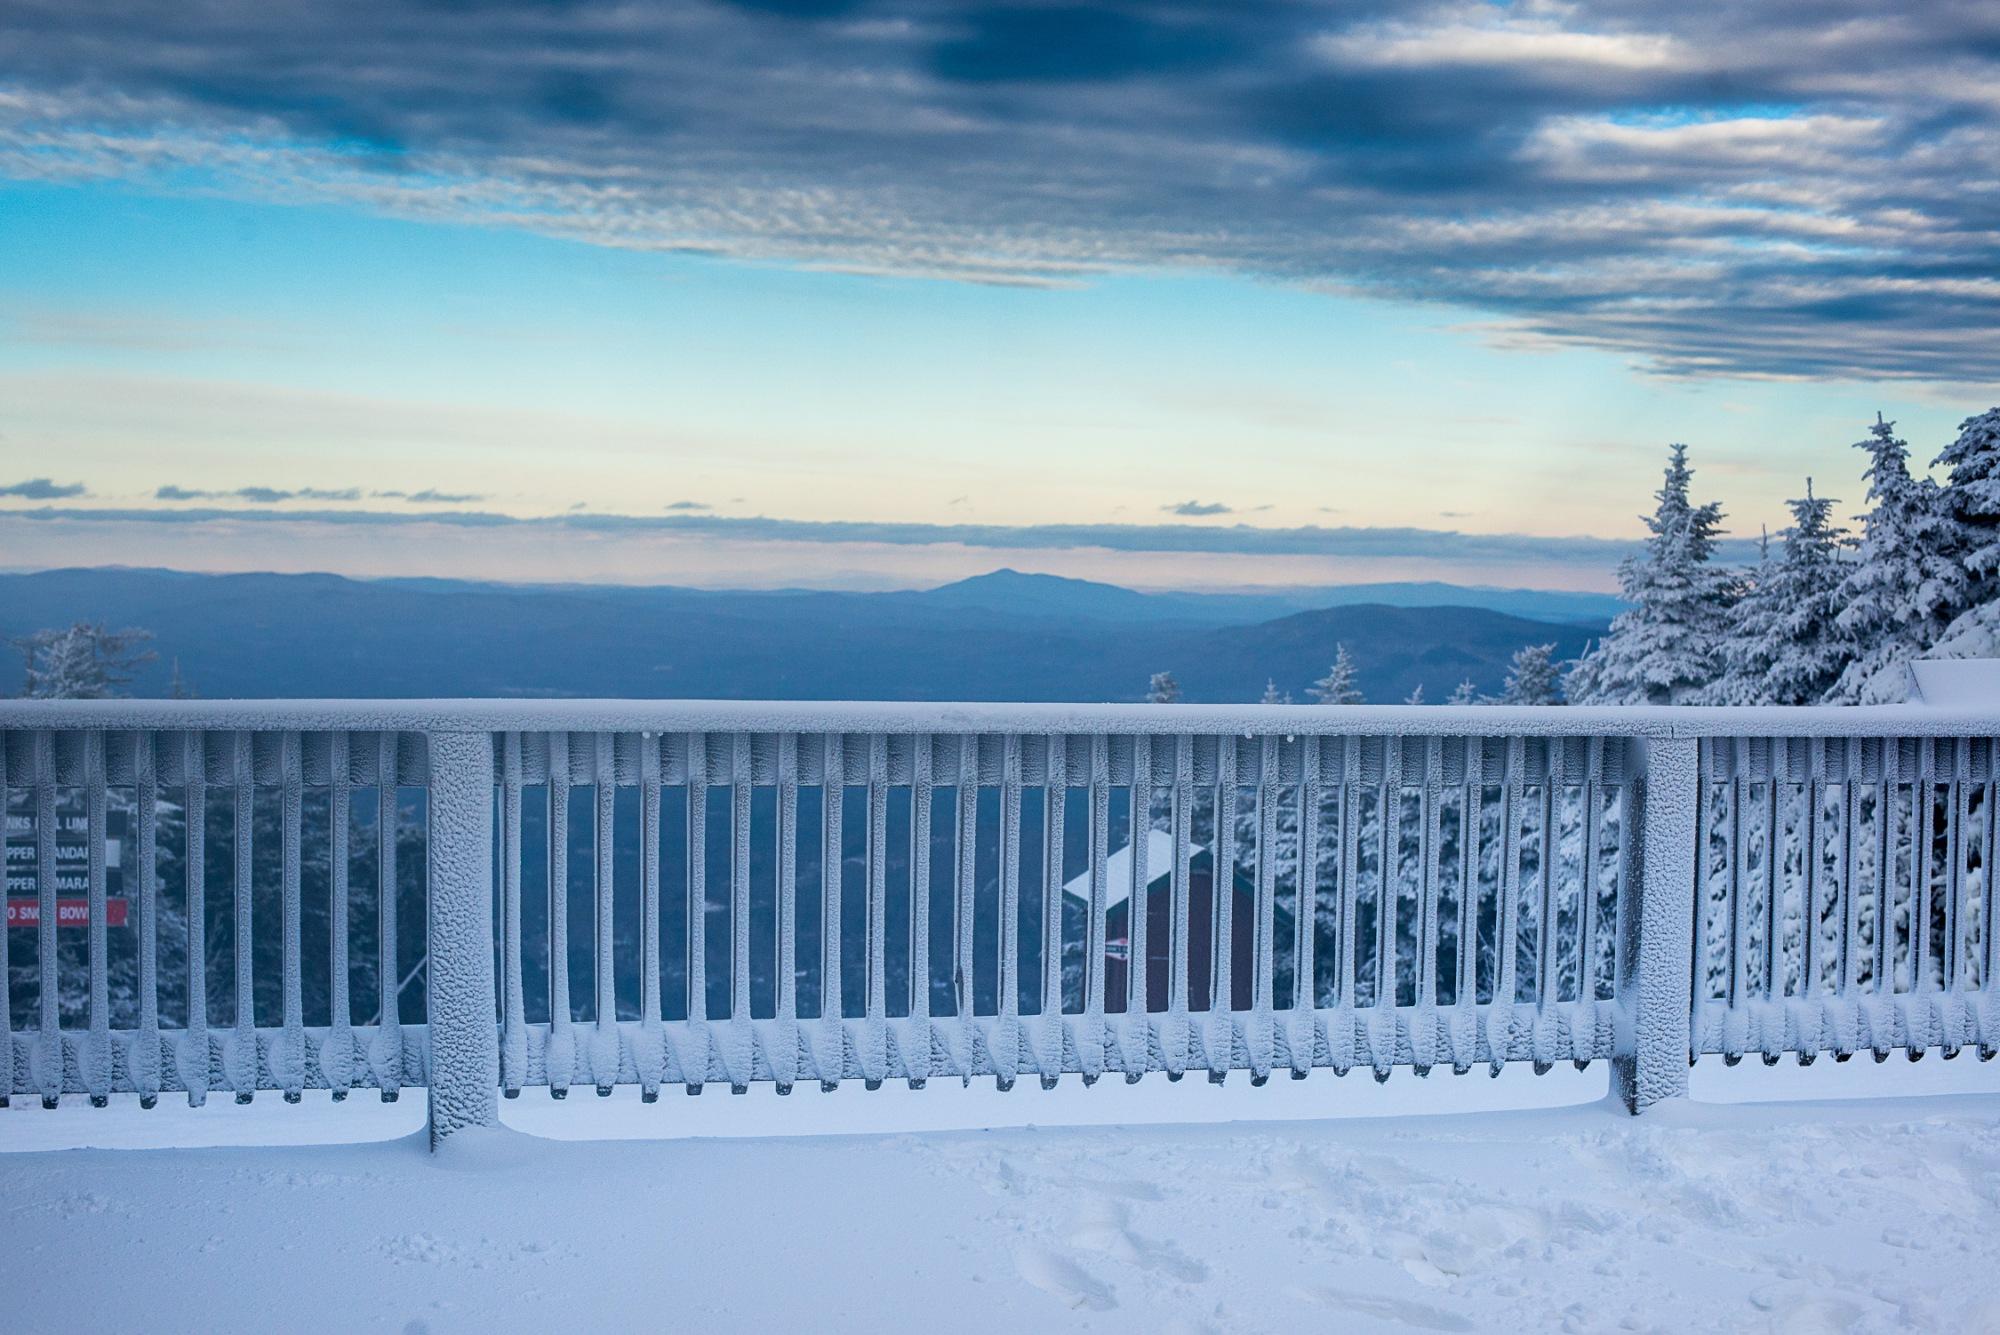 131208_HubertHausDeck_Snowy_HS